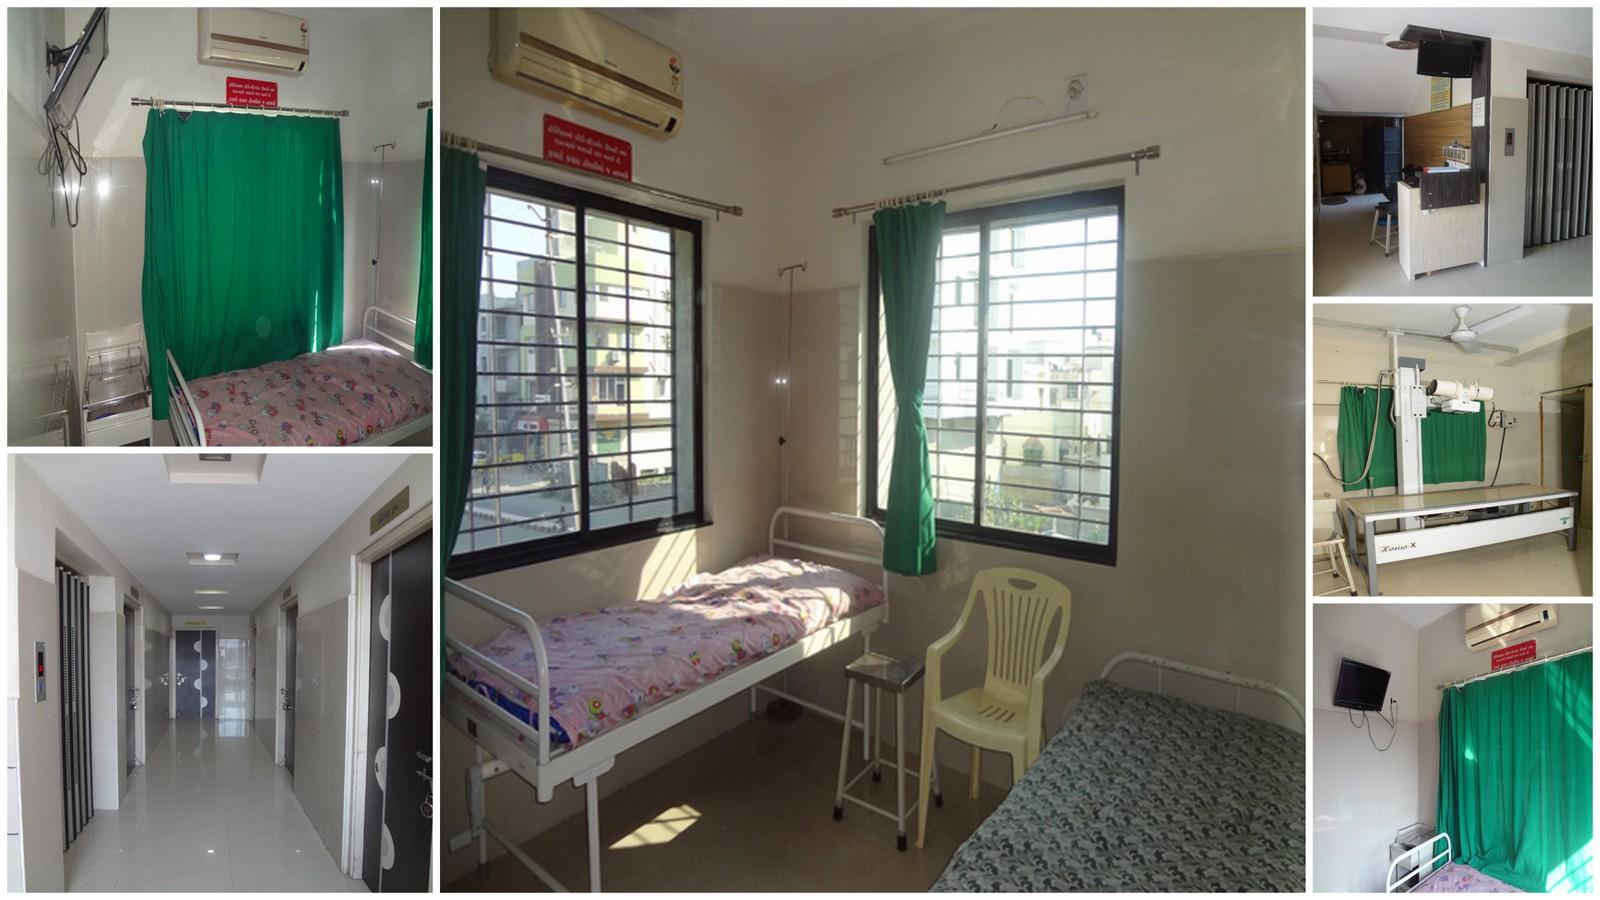 Garg Orthopaedic Hospital